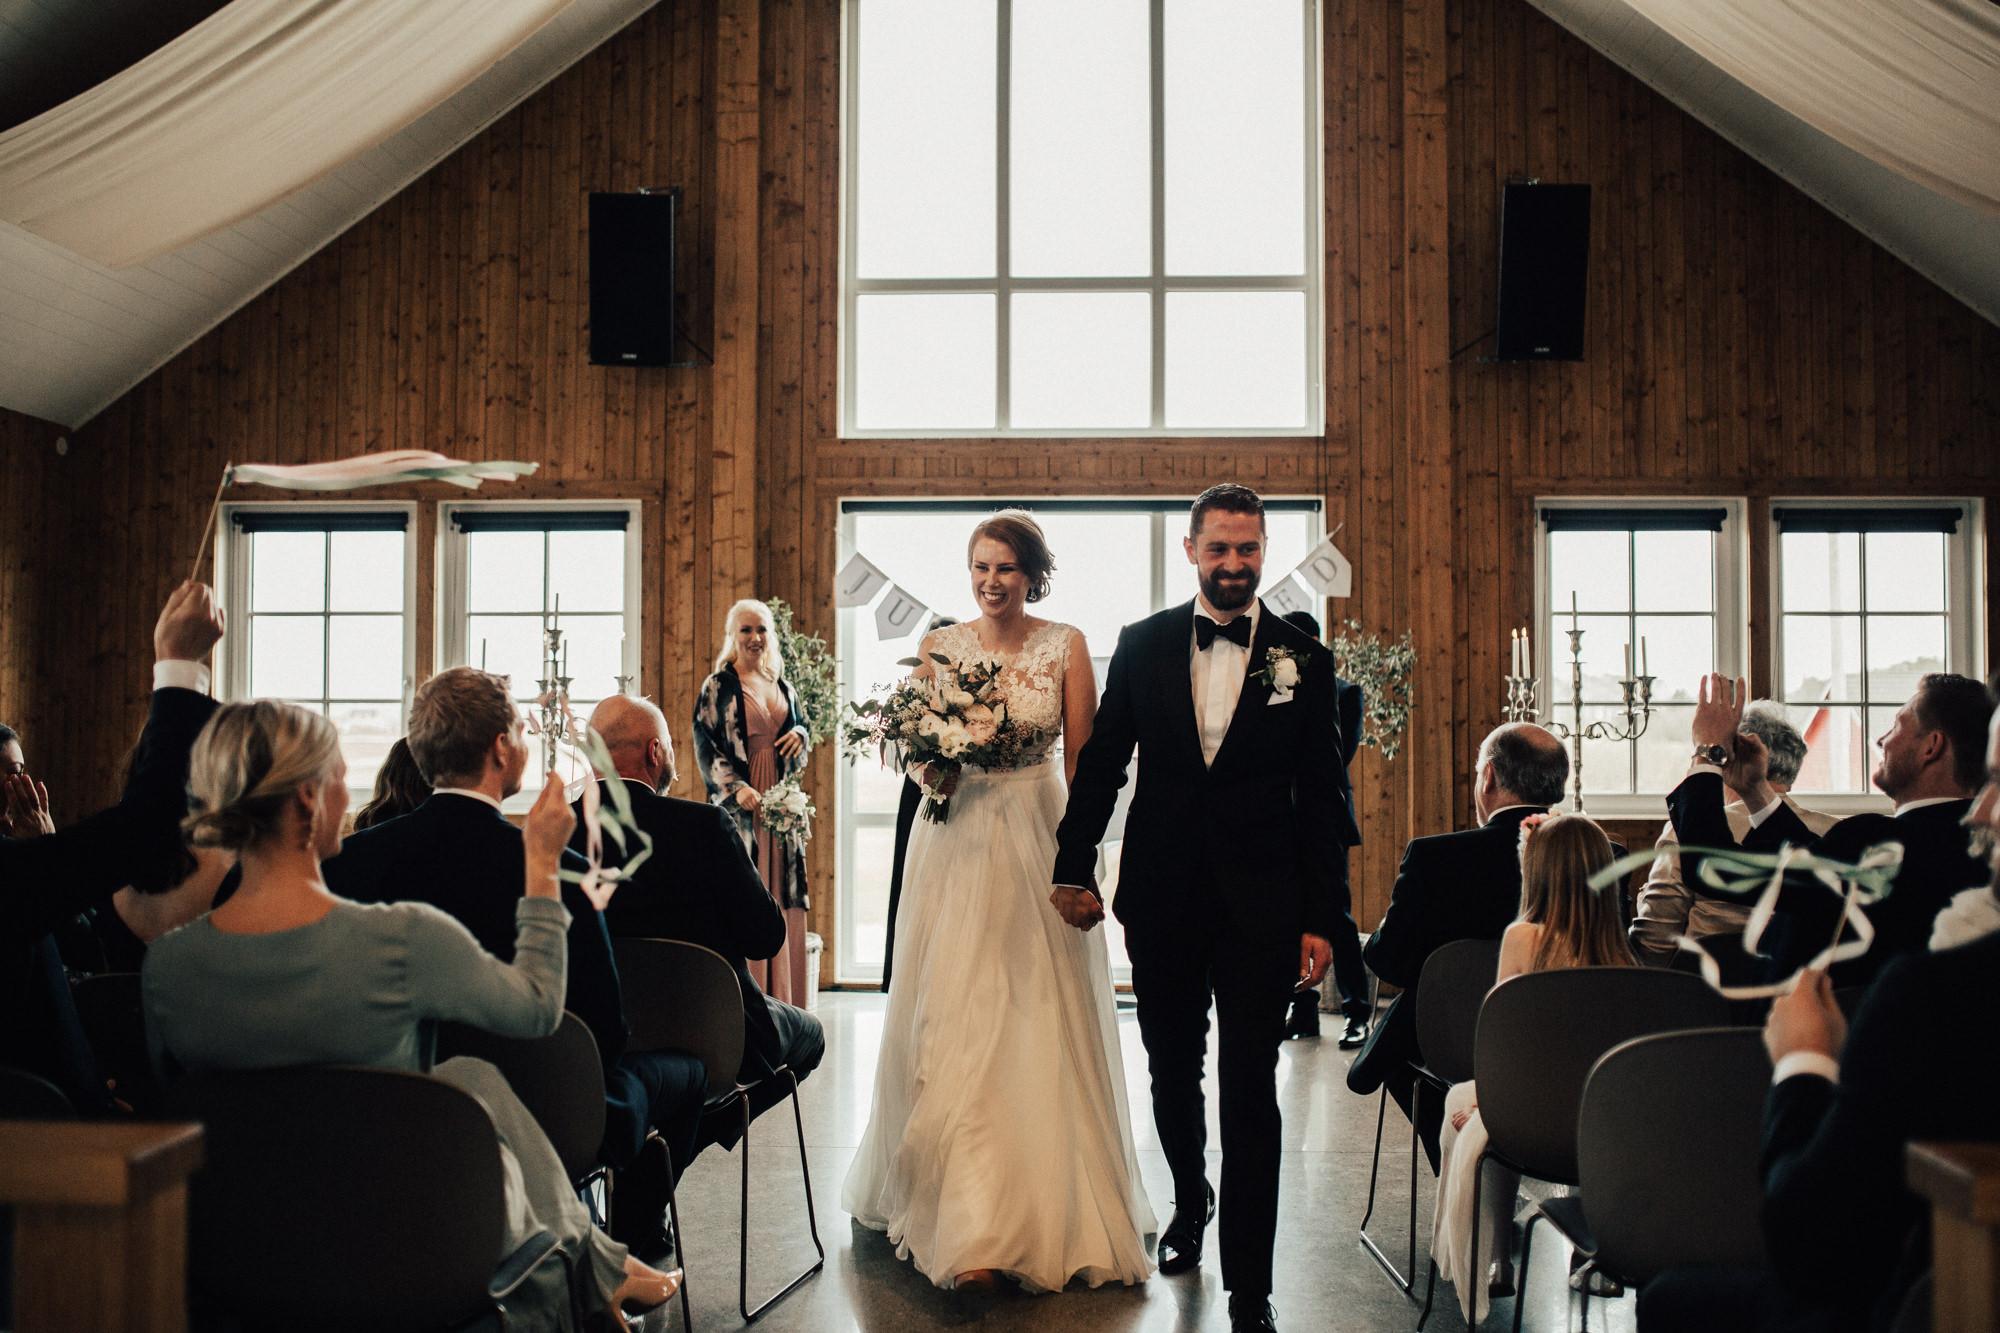 michaela_klouda_bryllup_solastranden_gård-104.jpg